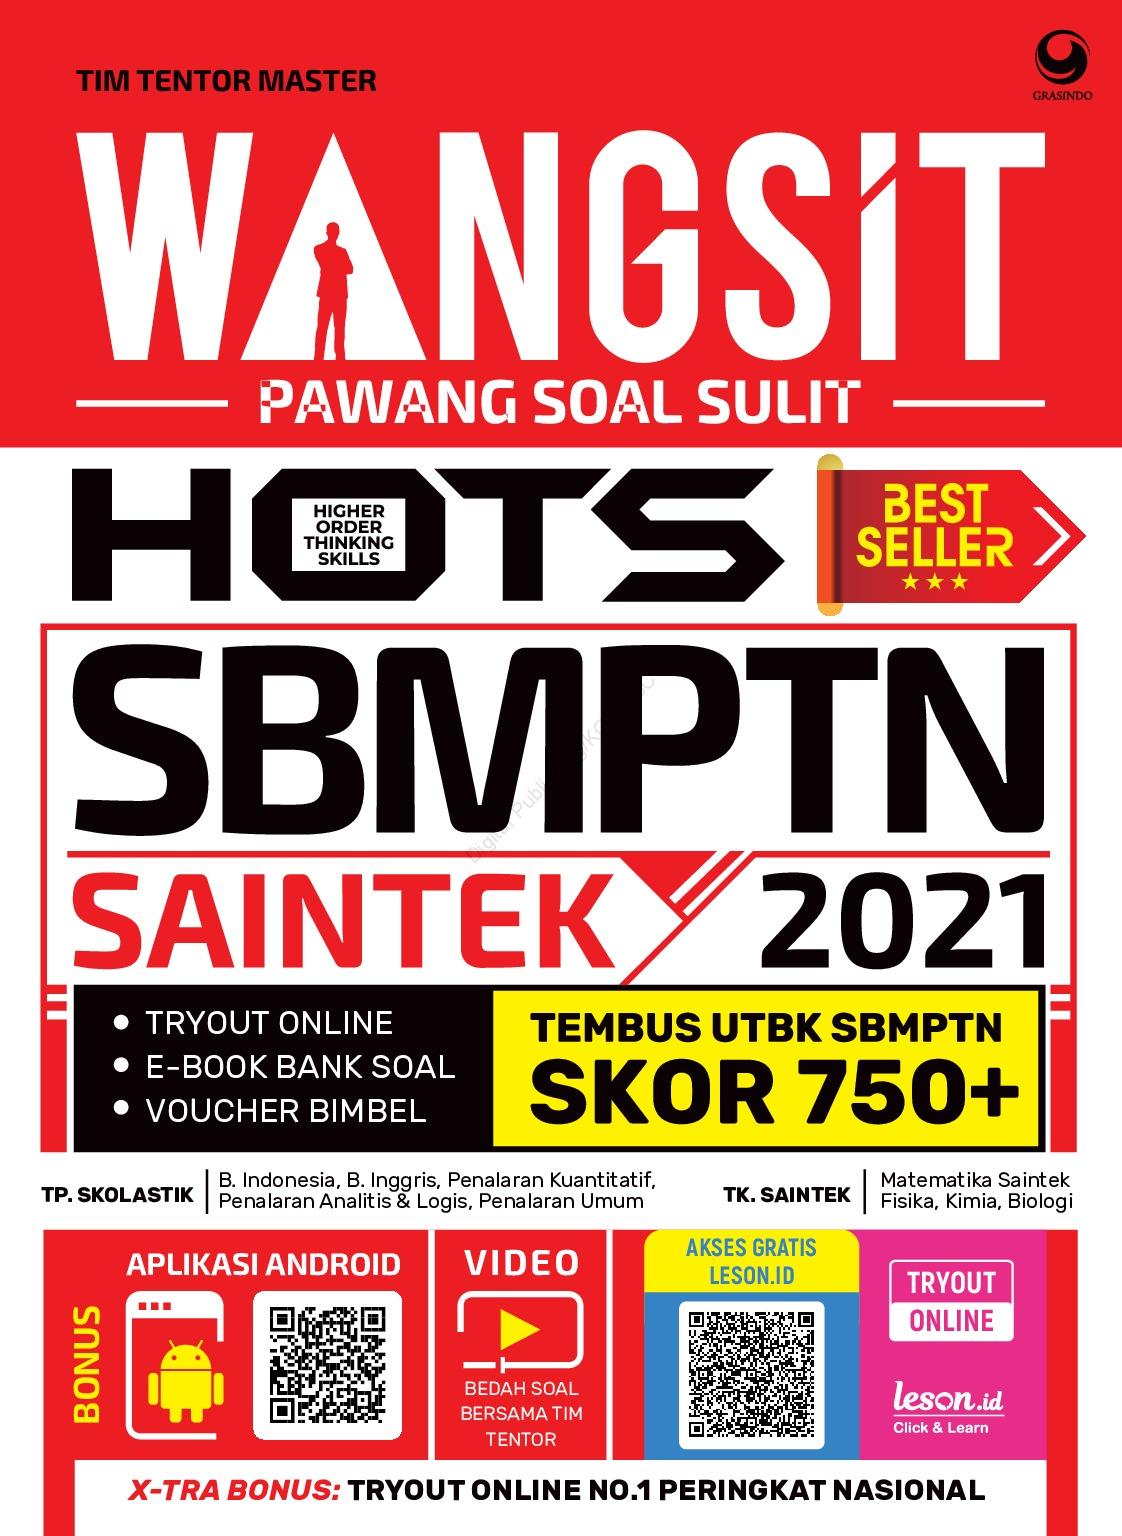 Jual Buku Wangsit Pawang Soal Sulit Hots Utbk Sbmptn Saintek 2021 Oleh Tim Tentor Master Gramedia Digital Indonesia